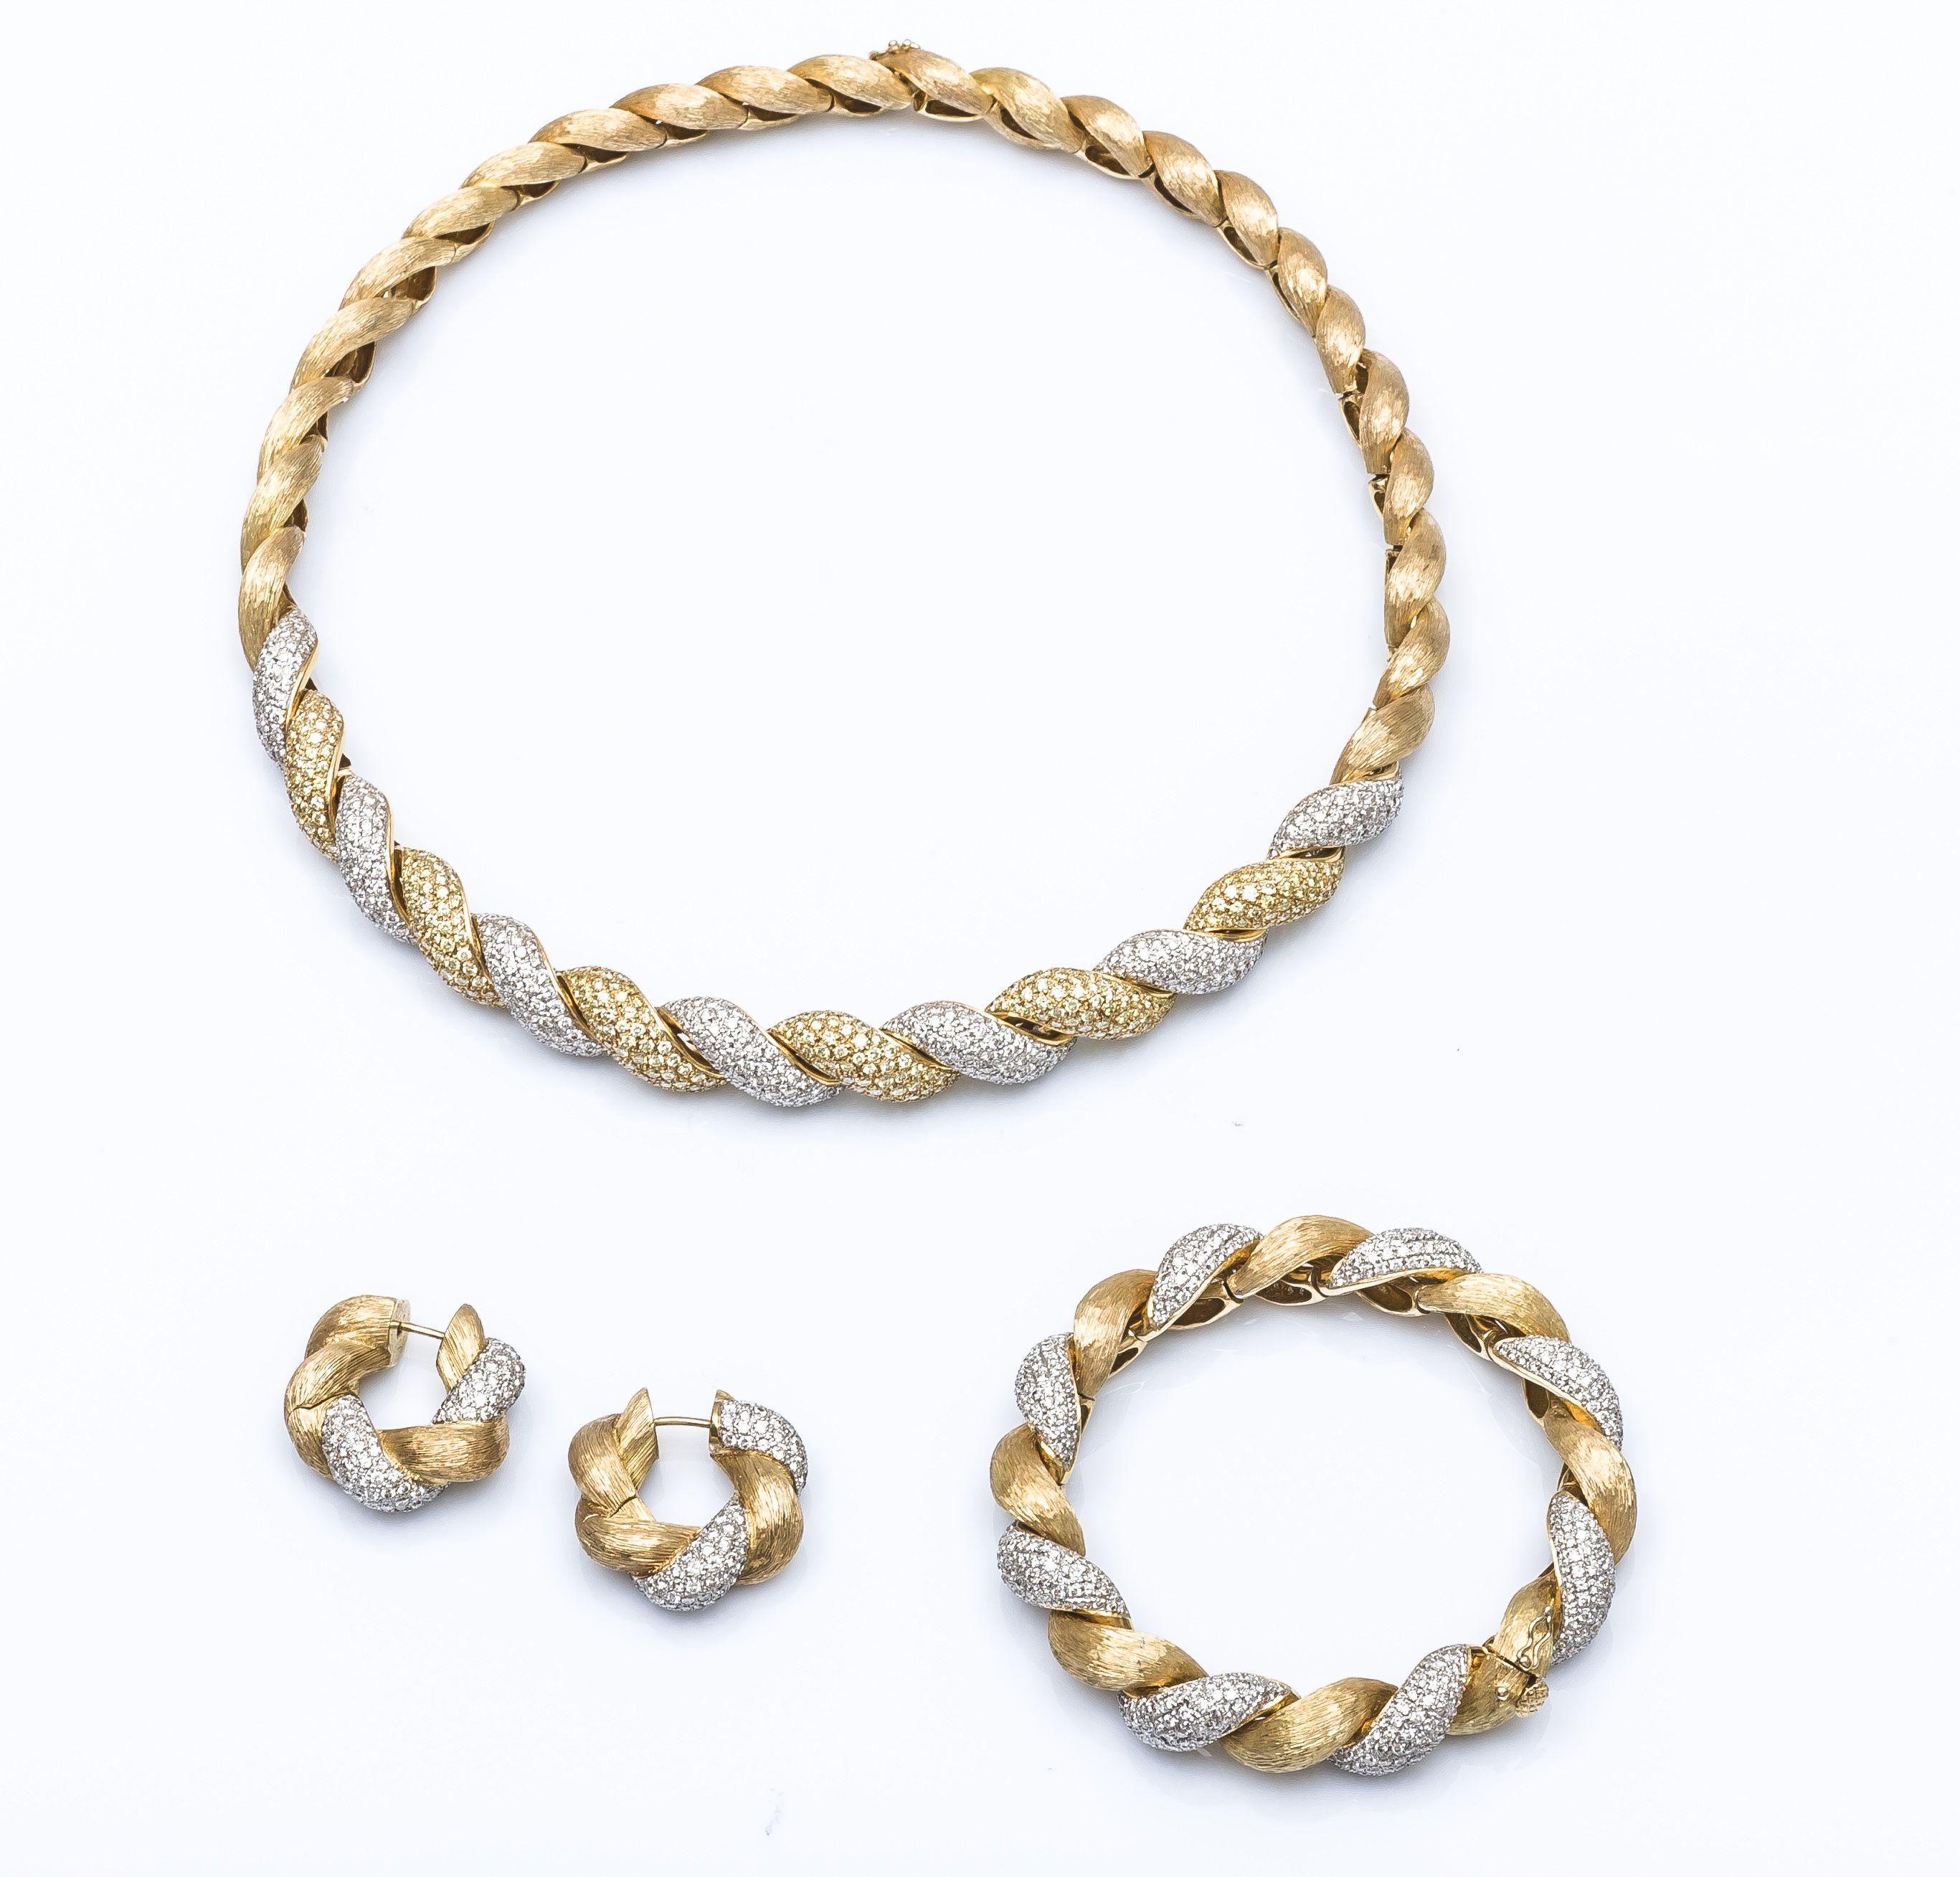 Swarovski vintage 12 gemmes 12mm amethyst perles à sertir